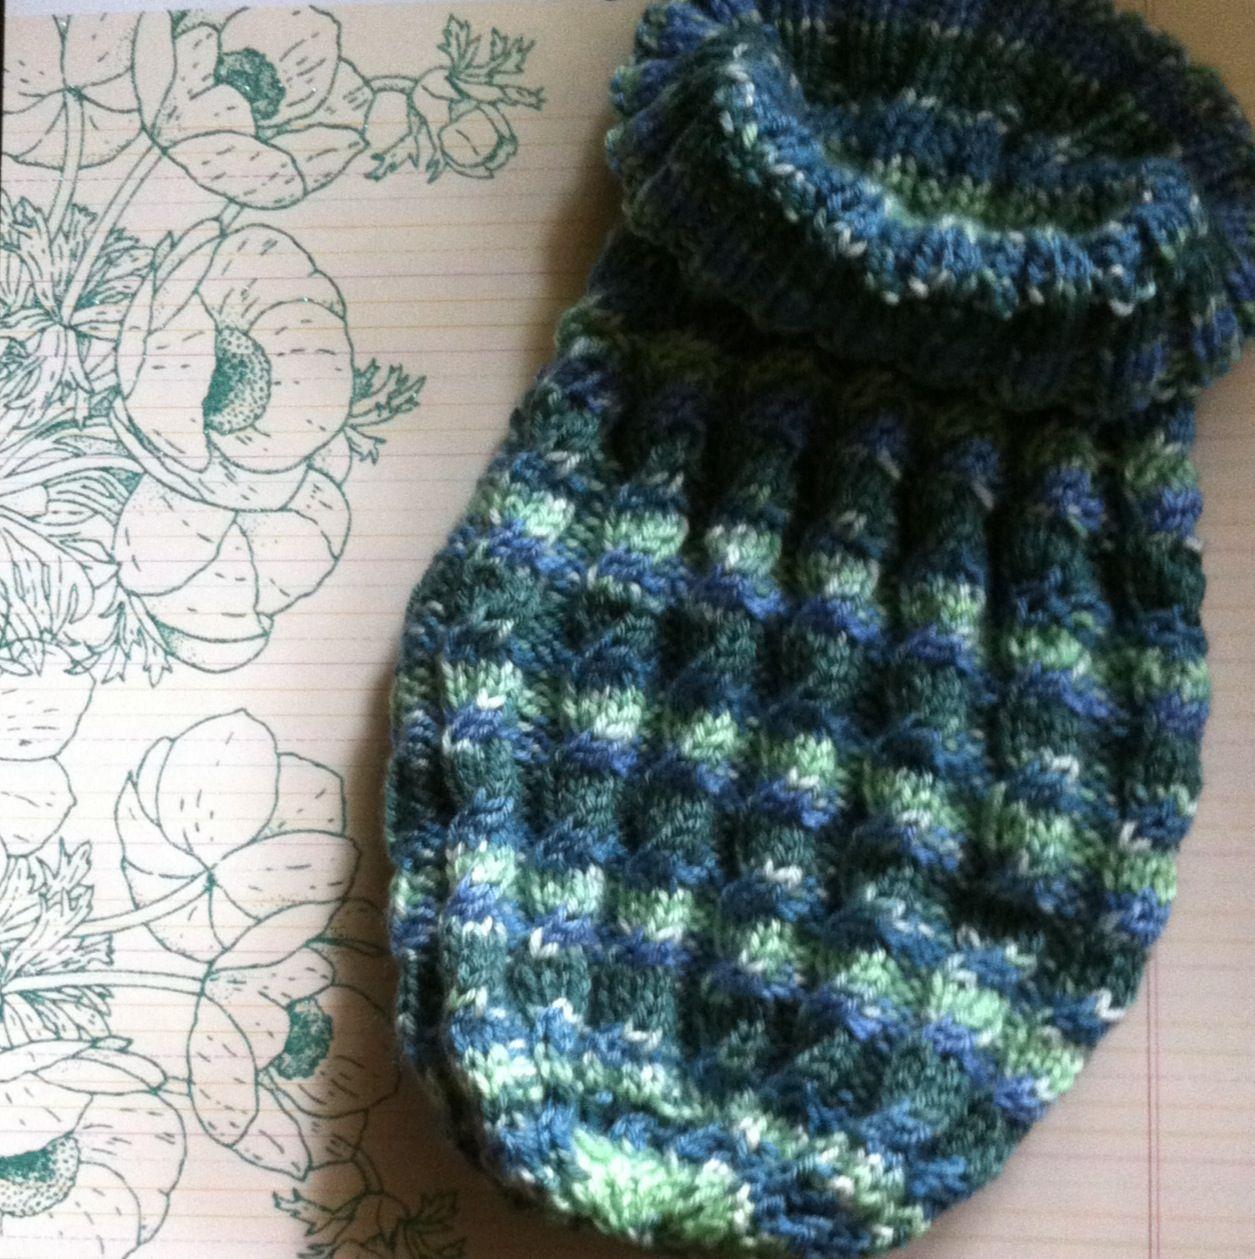 Free Crochet Pattern For Preemie Cocoon : Knitted Preemie Cocoon patterns Pinterest